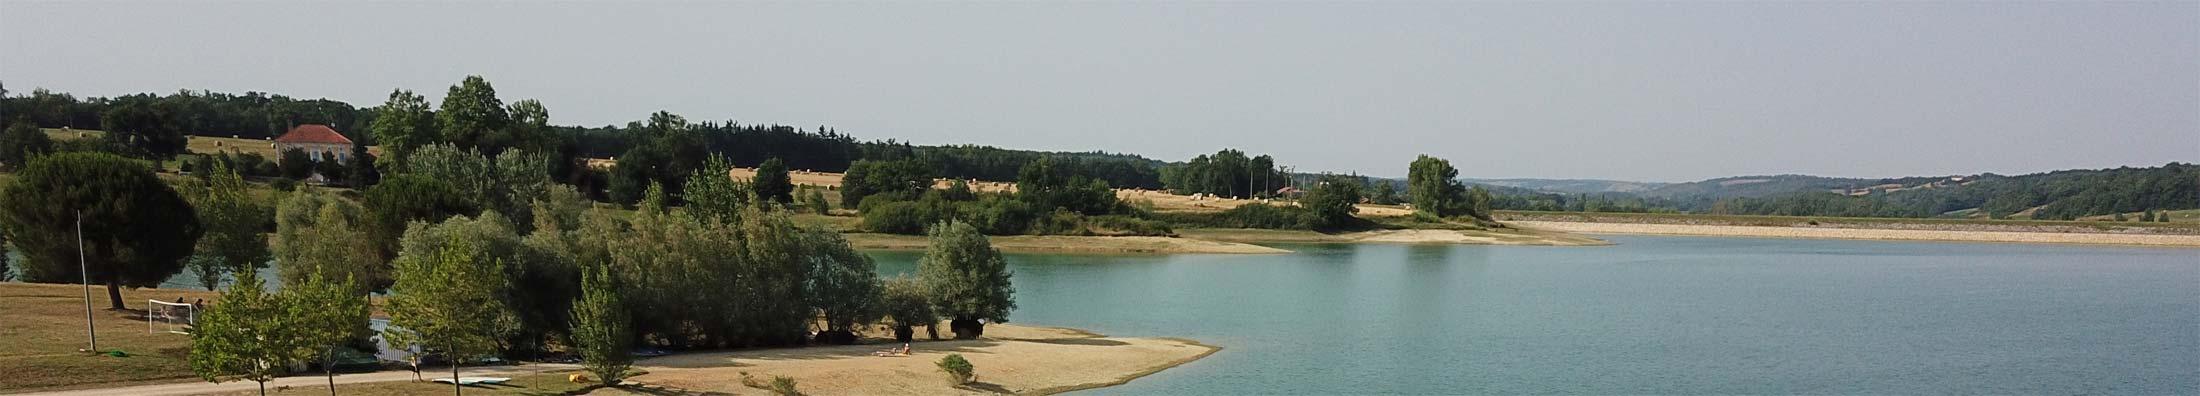 Beste Bed and Breakfast - Frankrijk - Occitanië - Midi-Pyrénées - Montbernard - Au Palmier de Barran - hoofdfoto